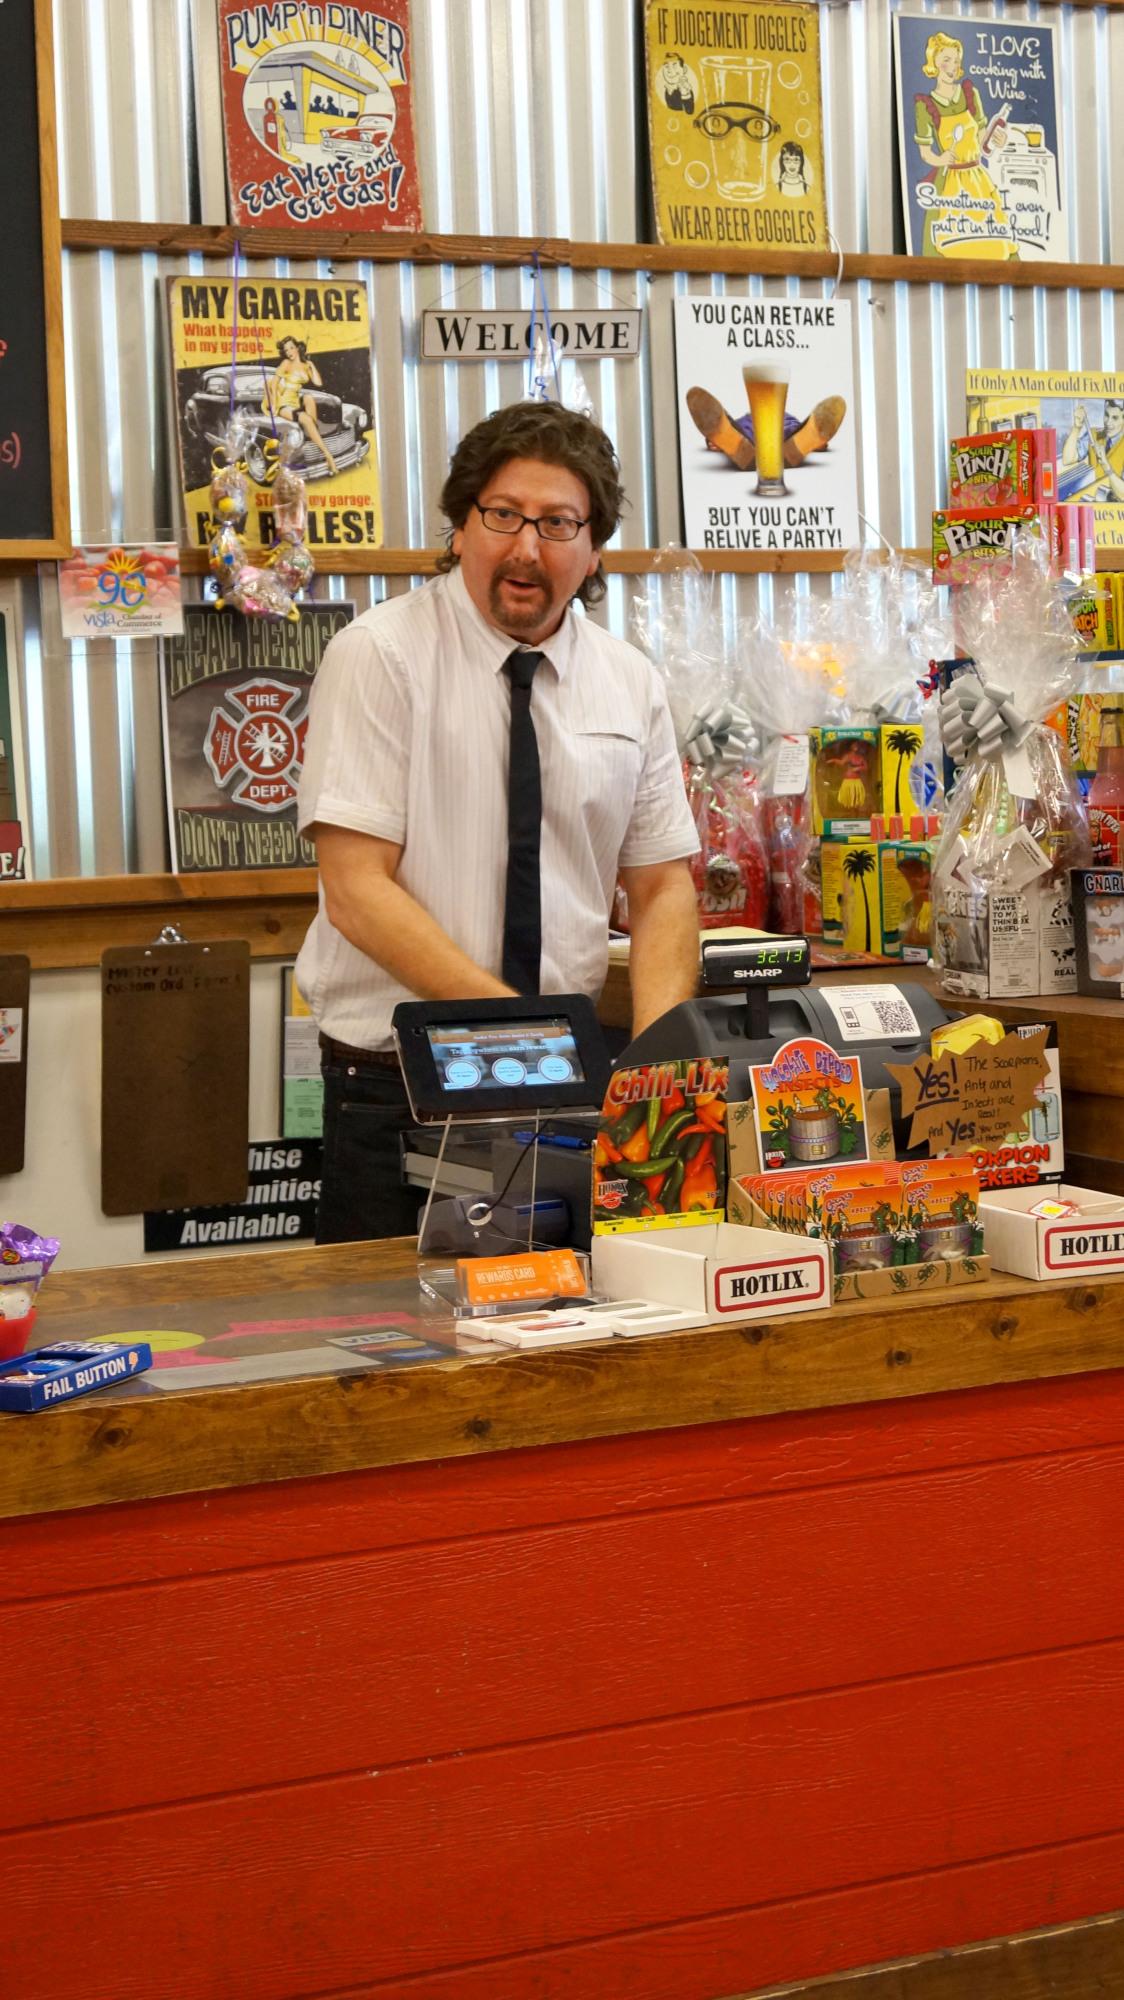 Robert at the register